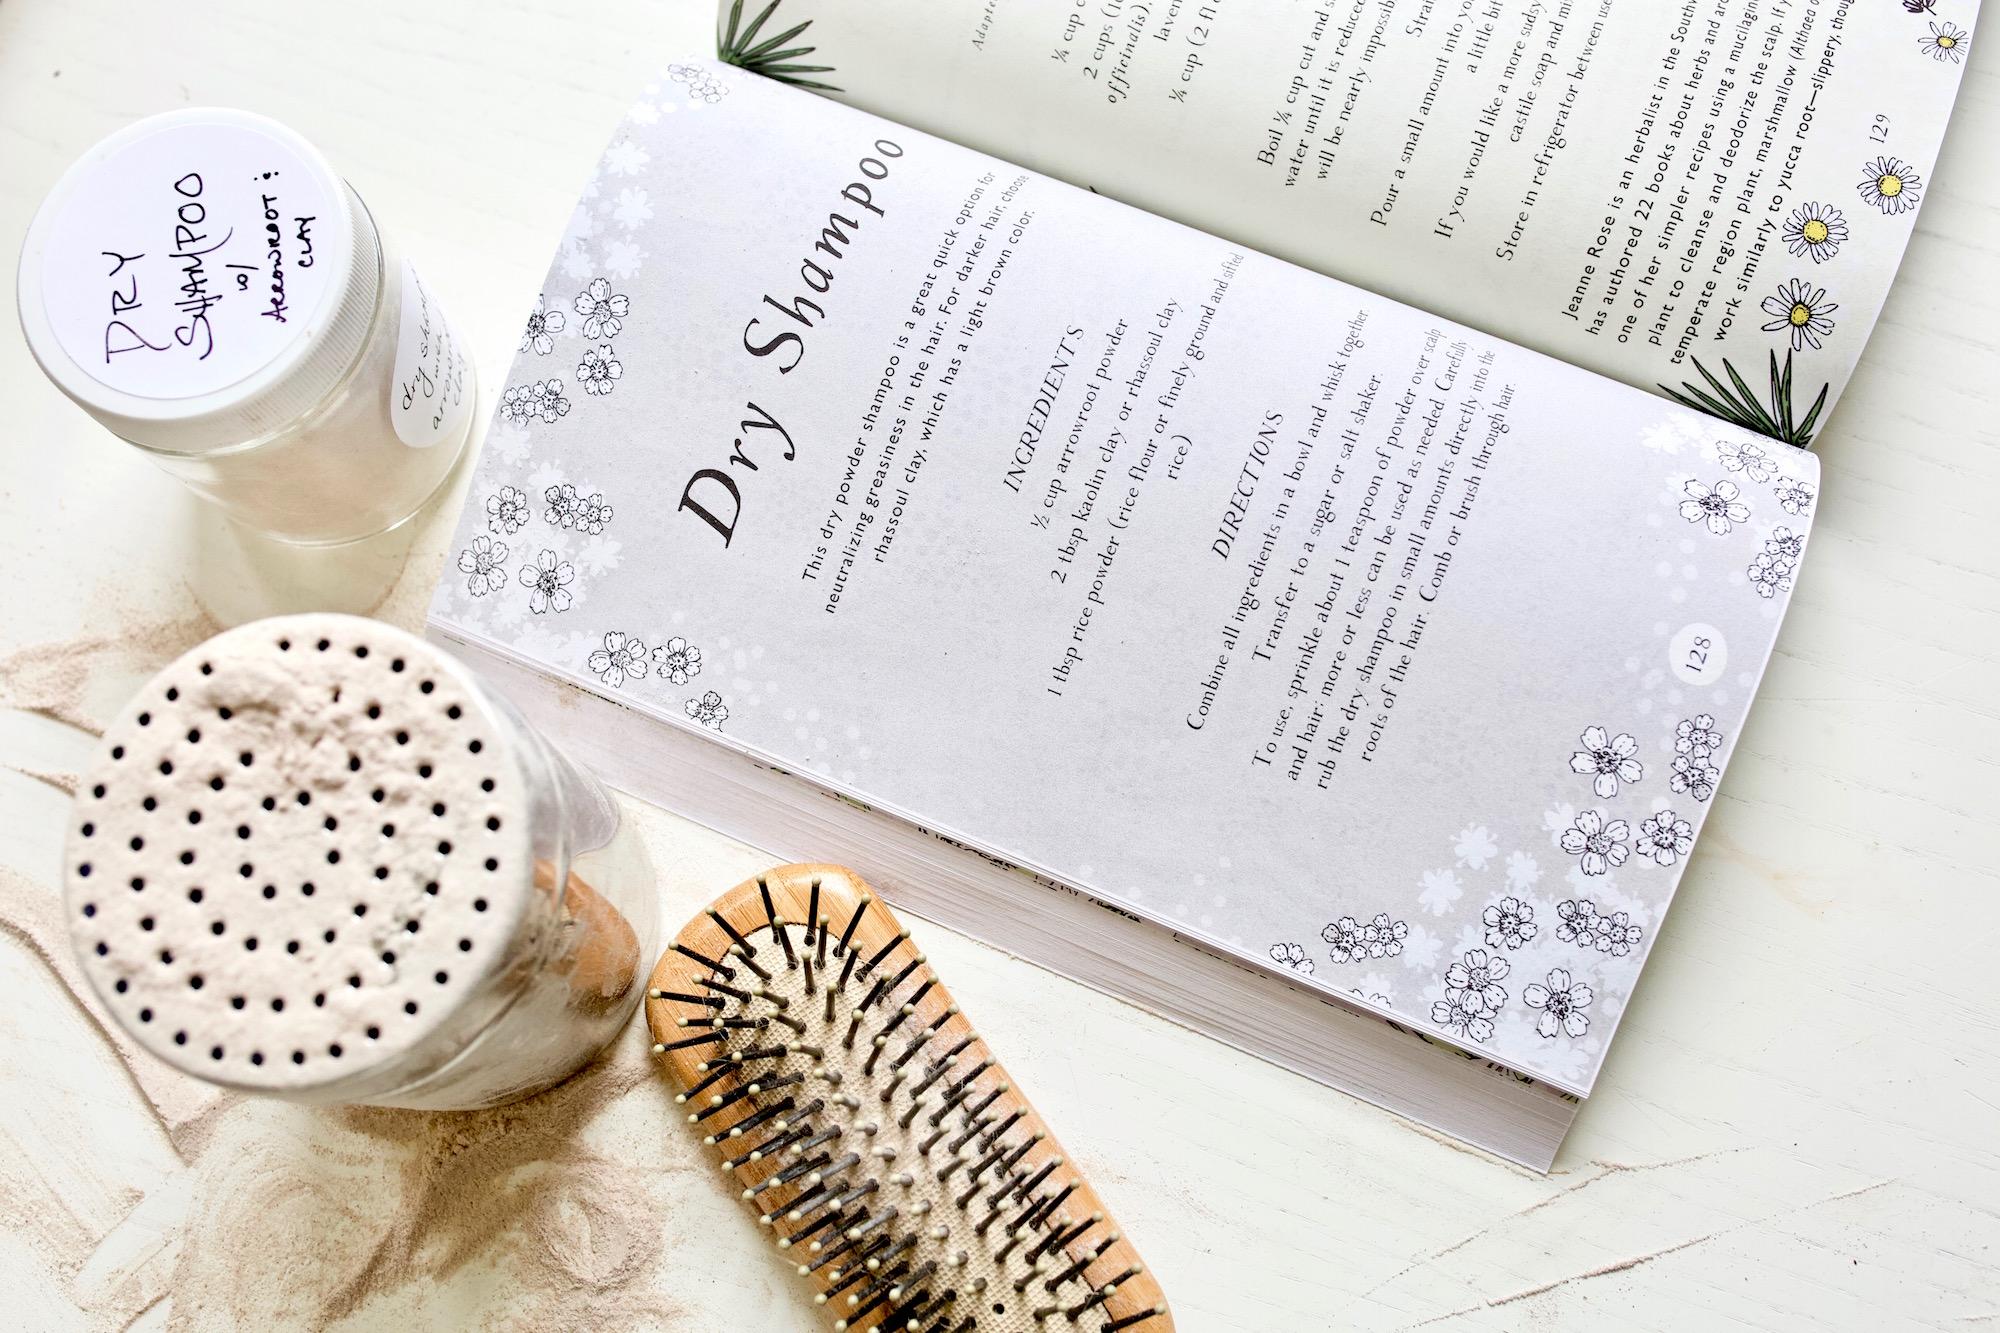 Dry Shampoo Recipe from the Botanical Skin Care Recipe Book